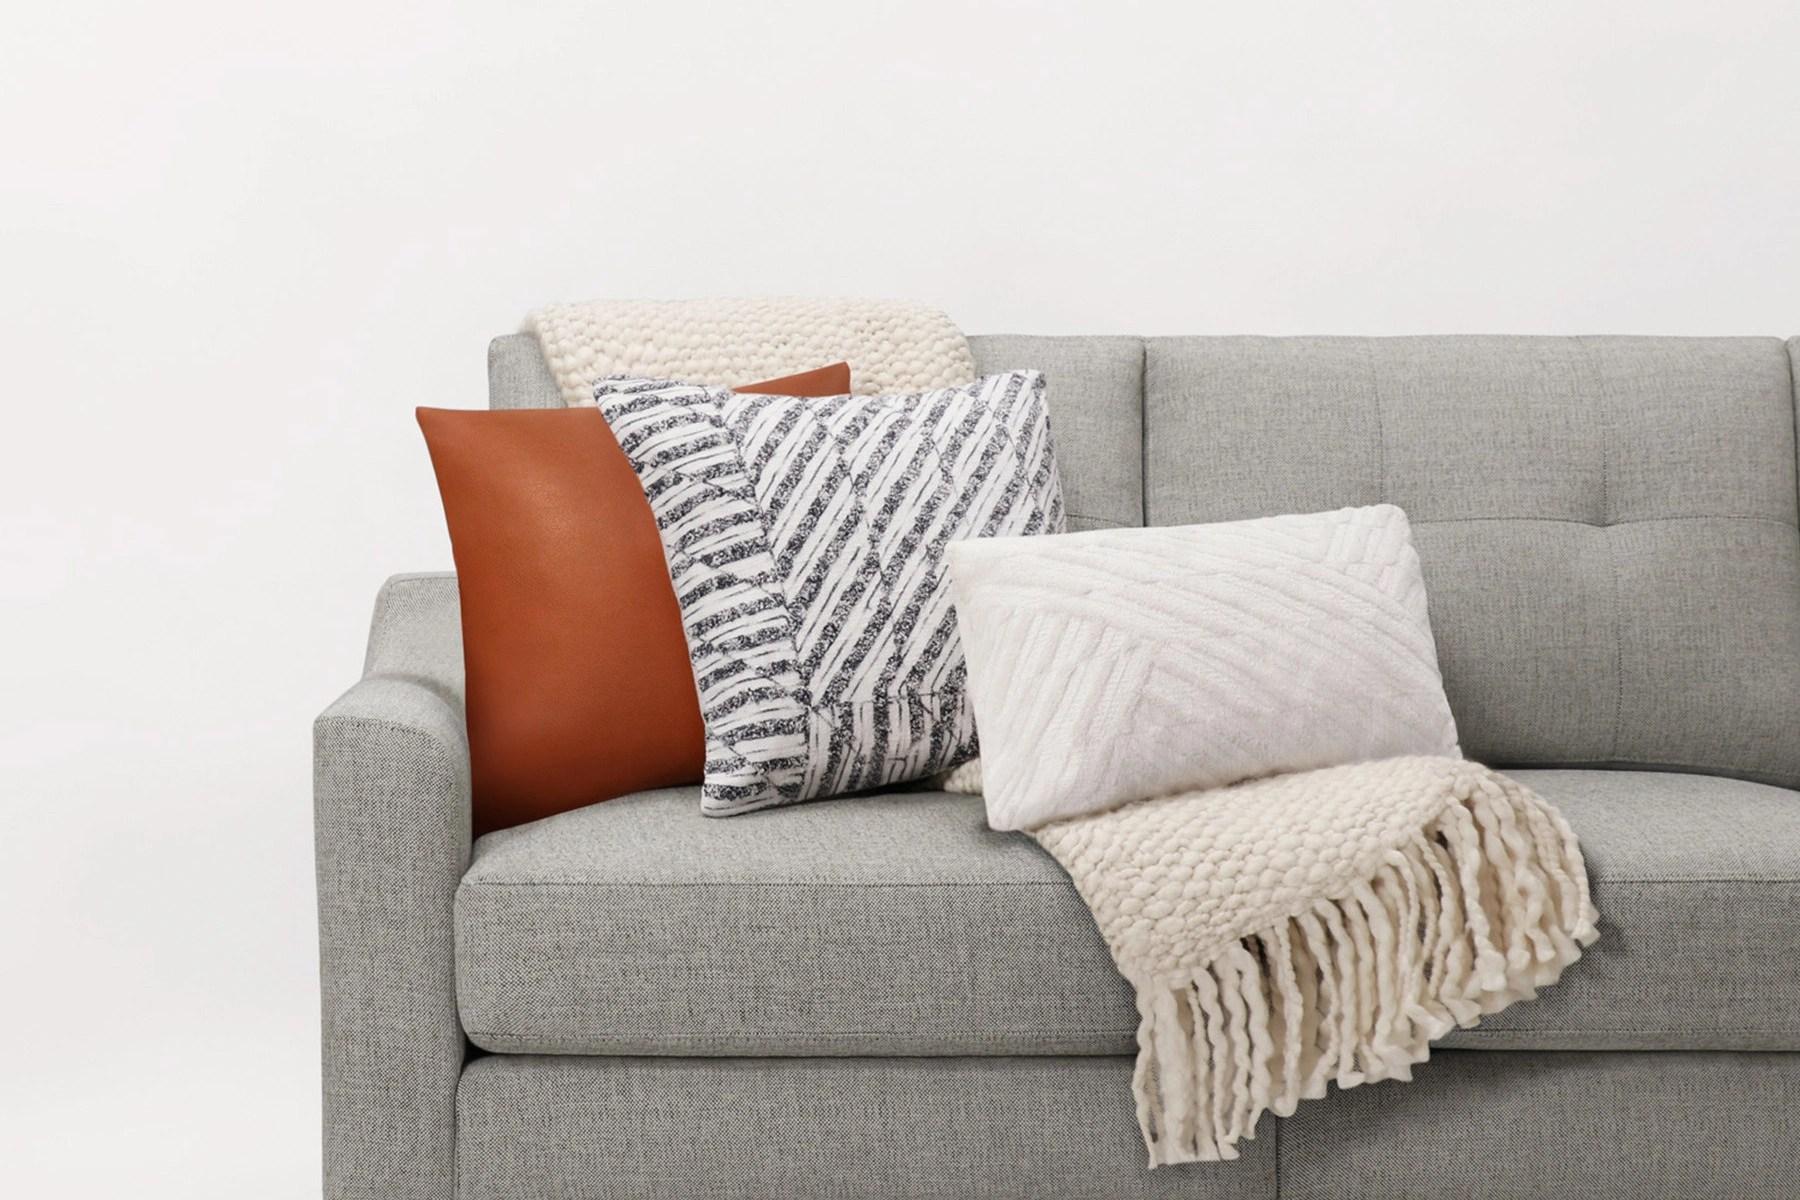 burrow pillow throw blanket bundles